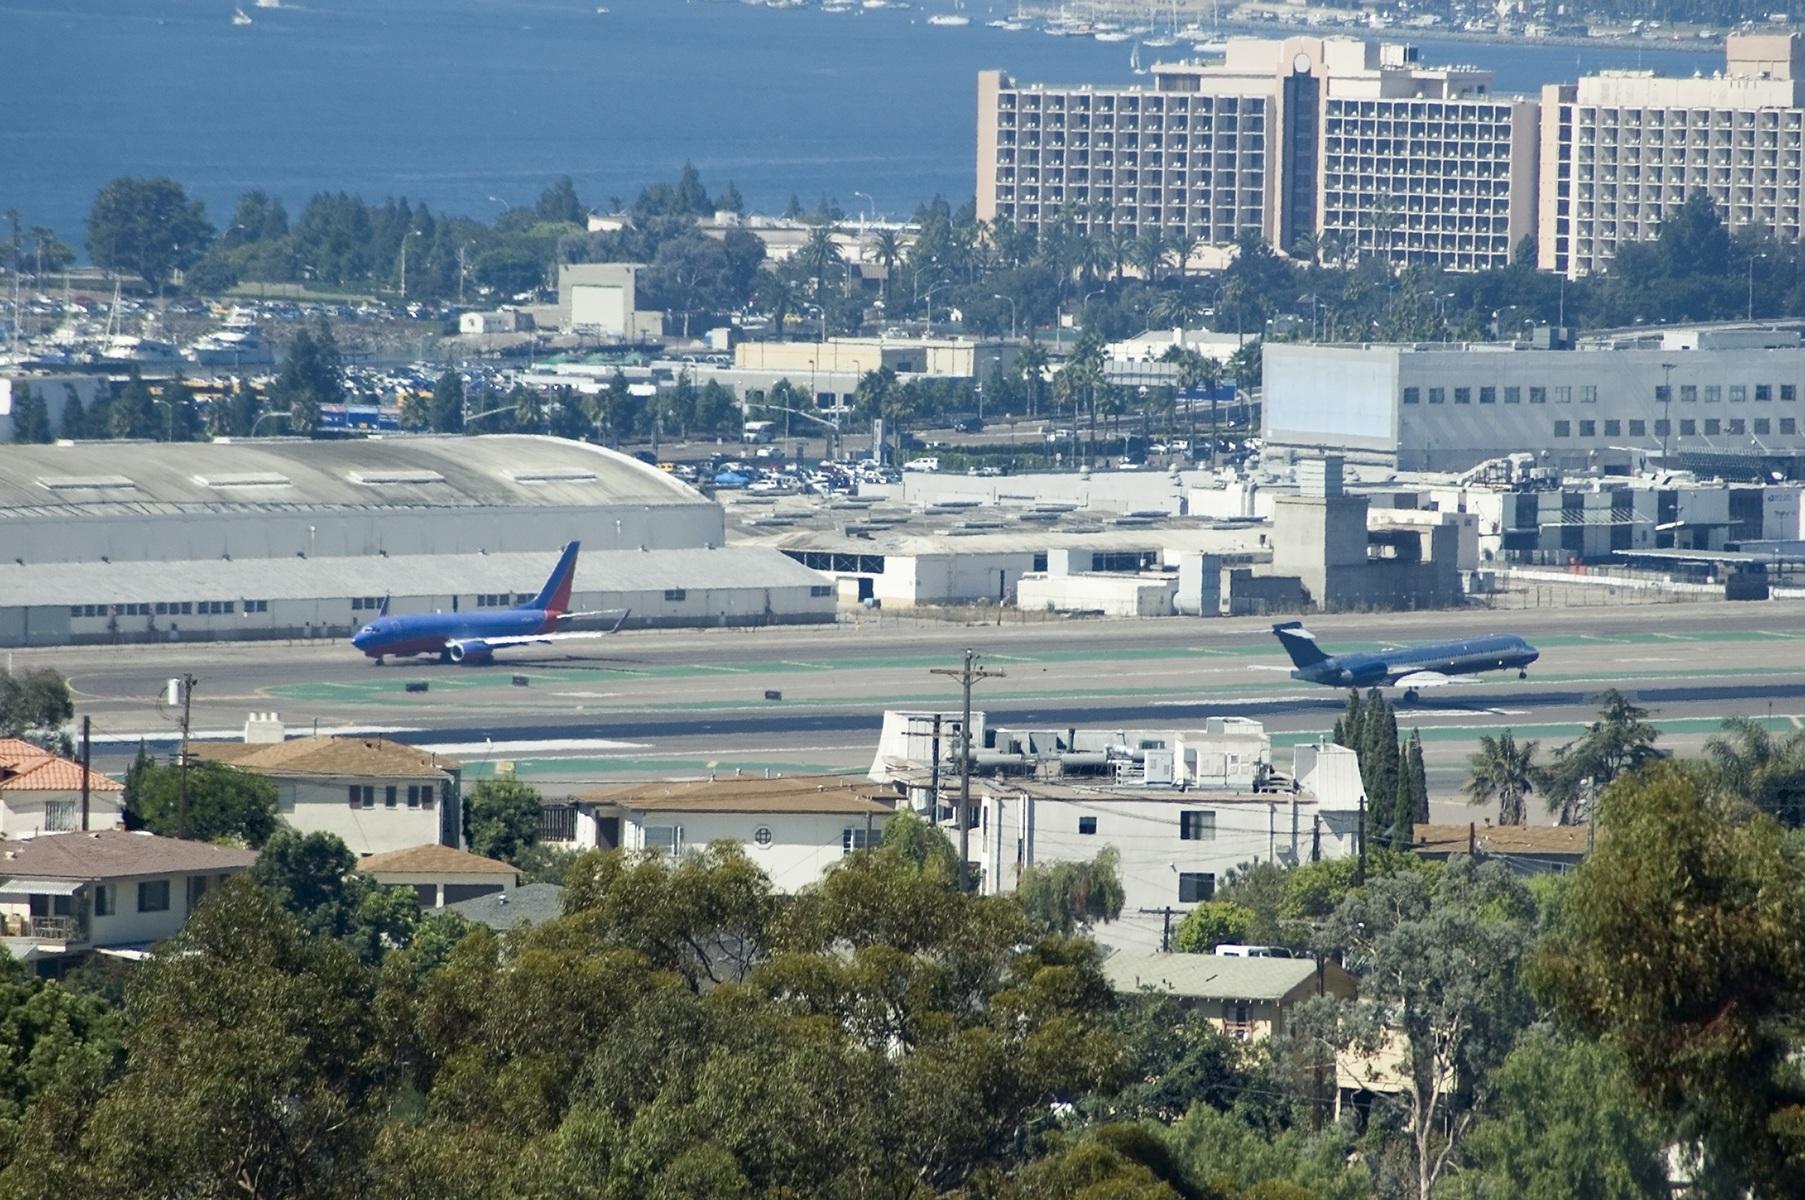 San Diego Airport plane landing